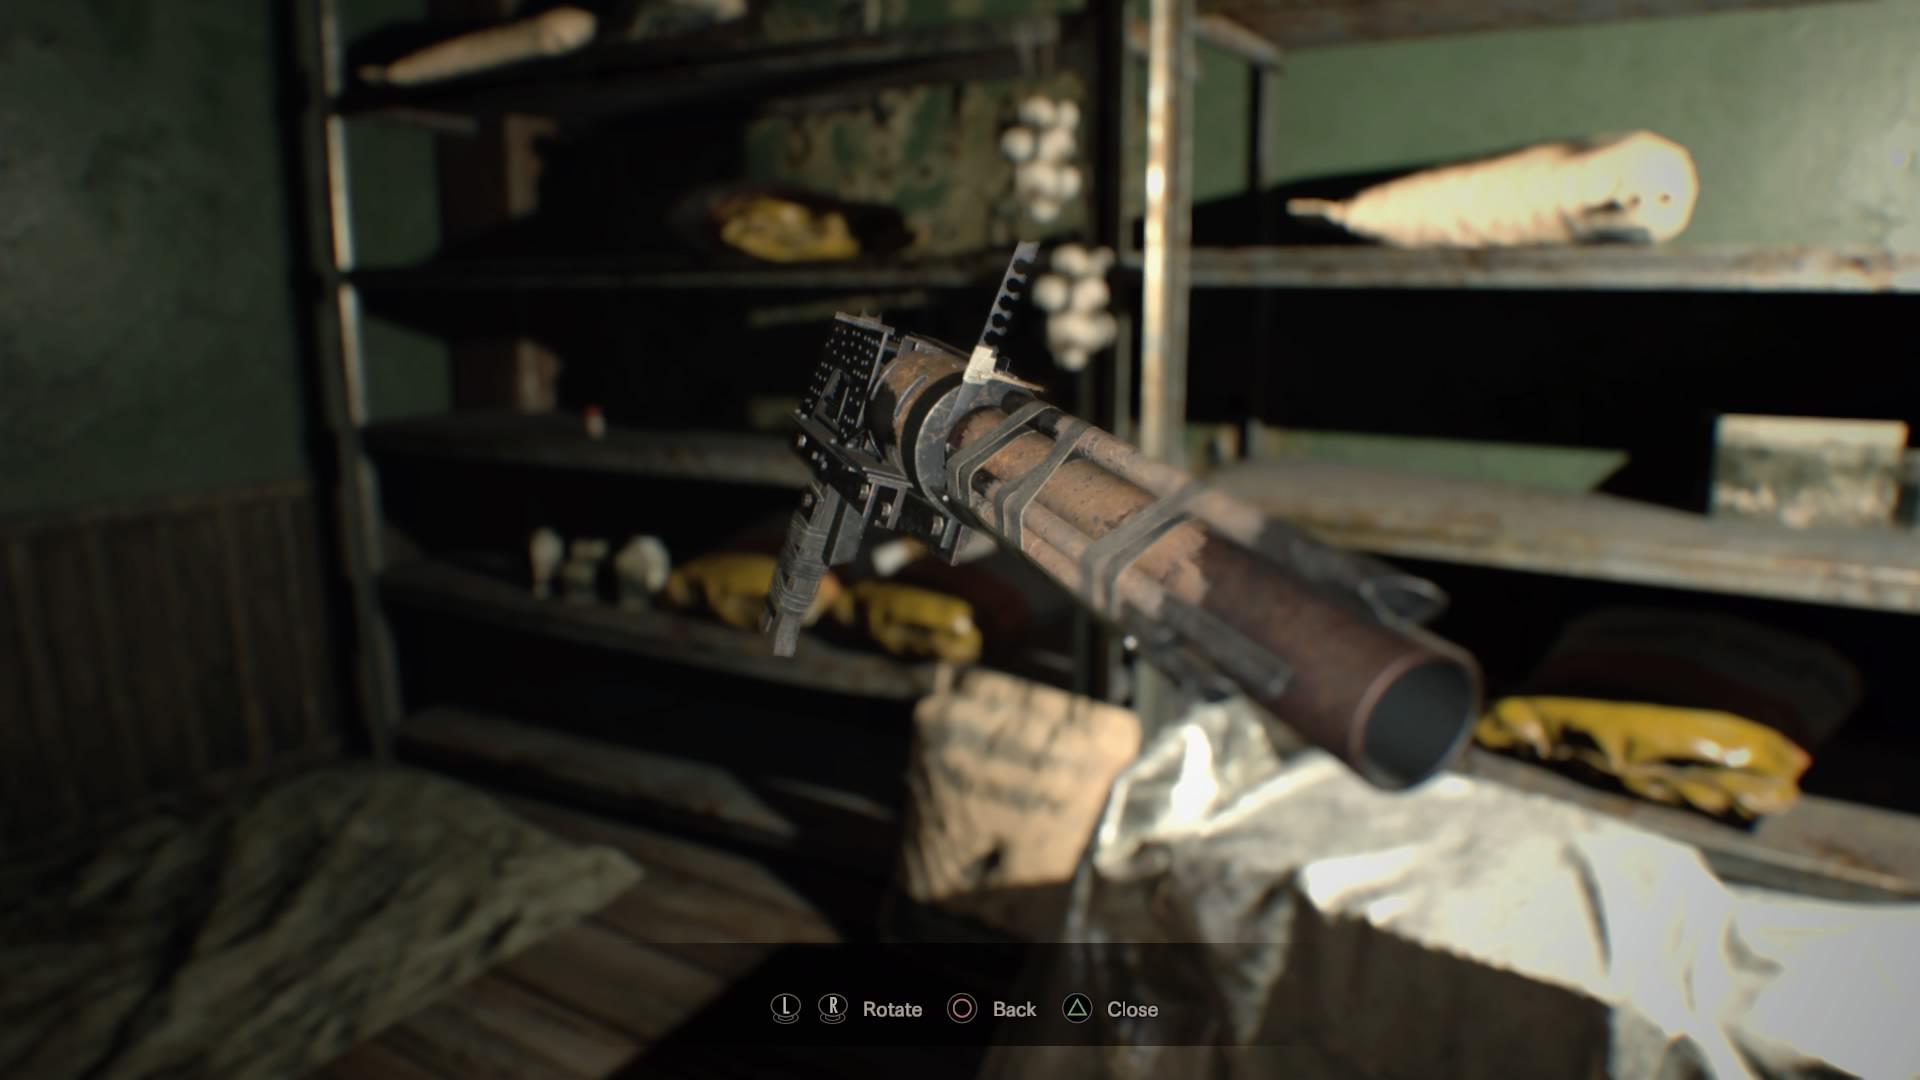 Drawn weapon coin gun Resident Biohazard Guide Launcher Locations